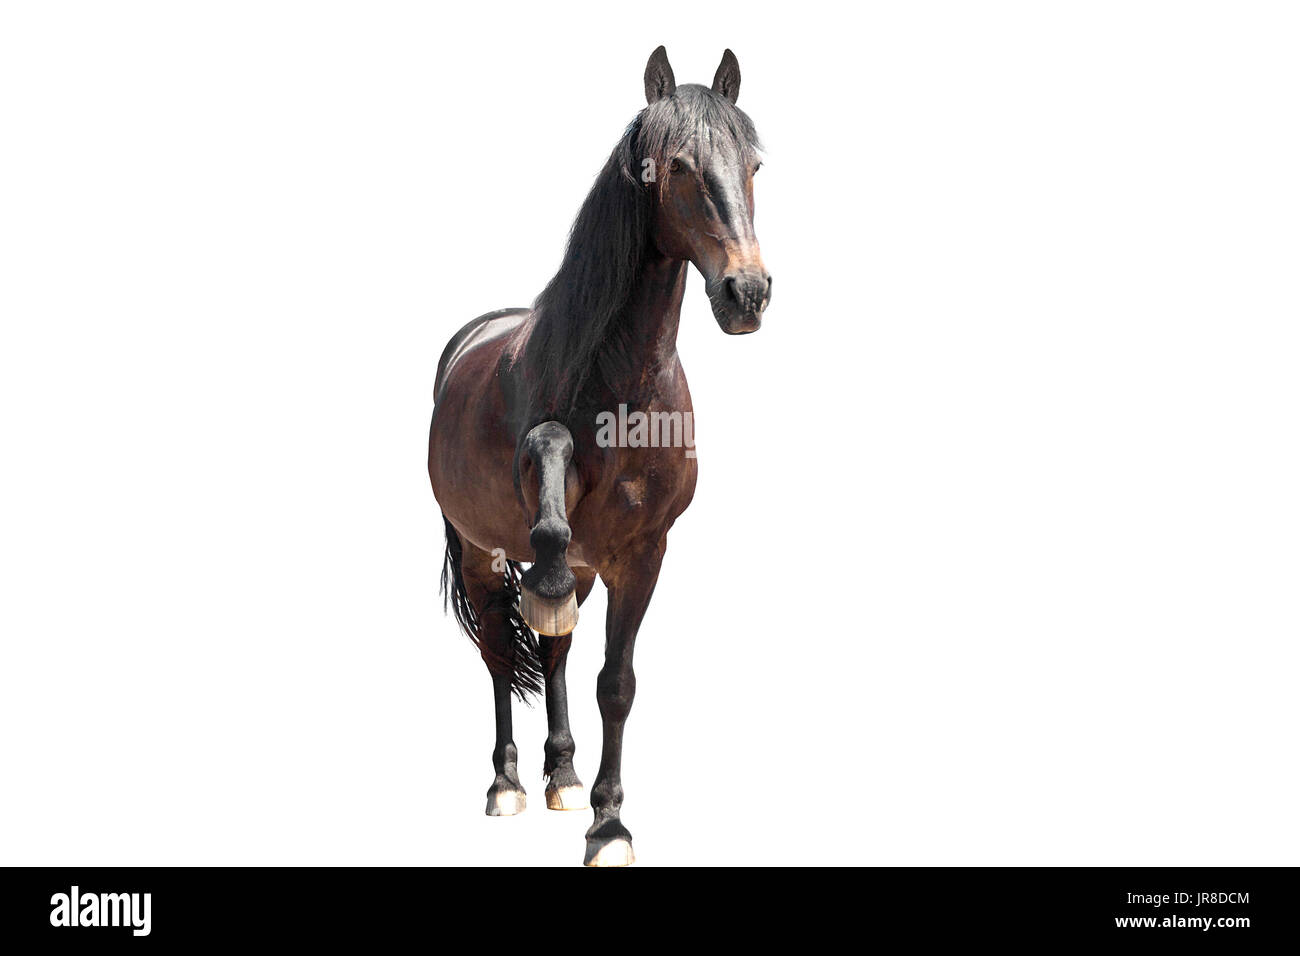 funny horse say hello and lift the hoof Stock Photo